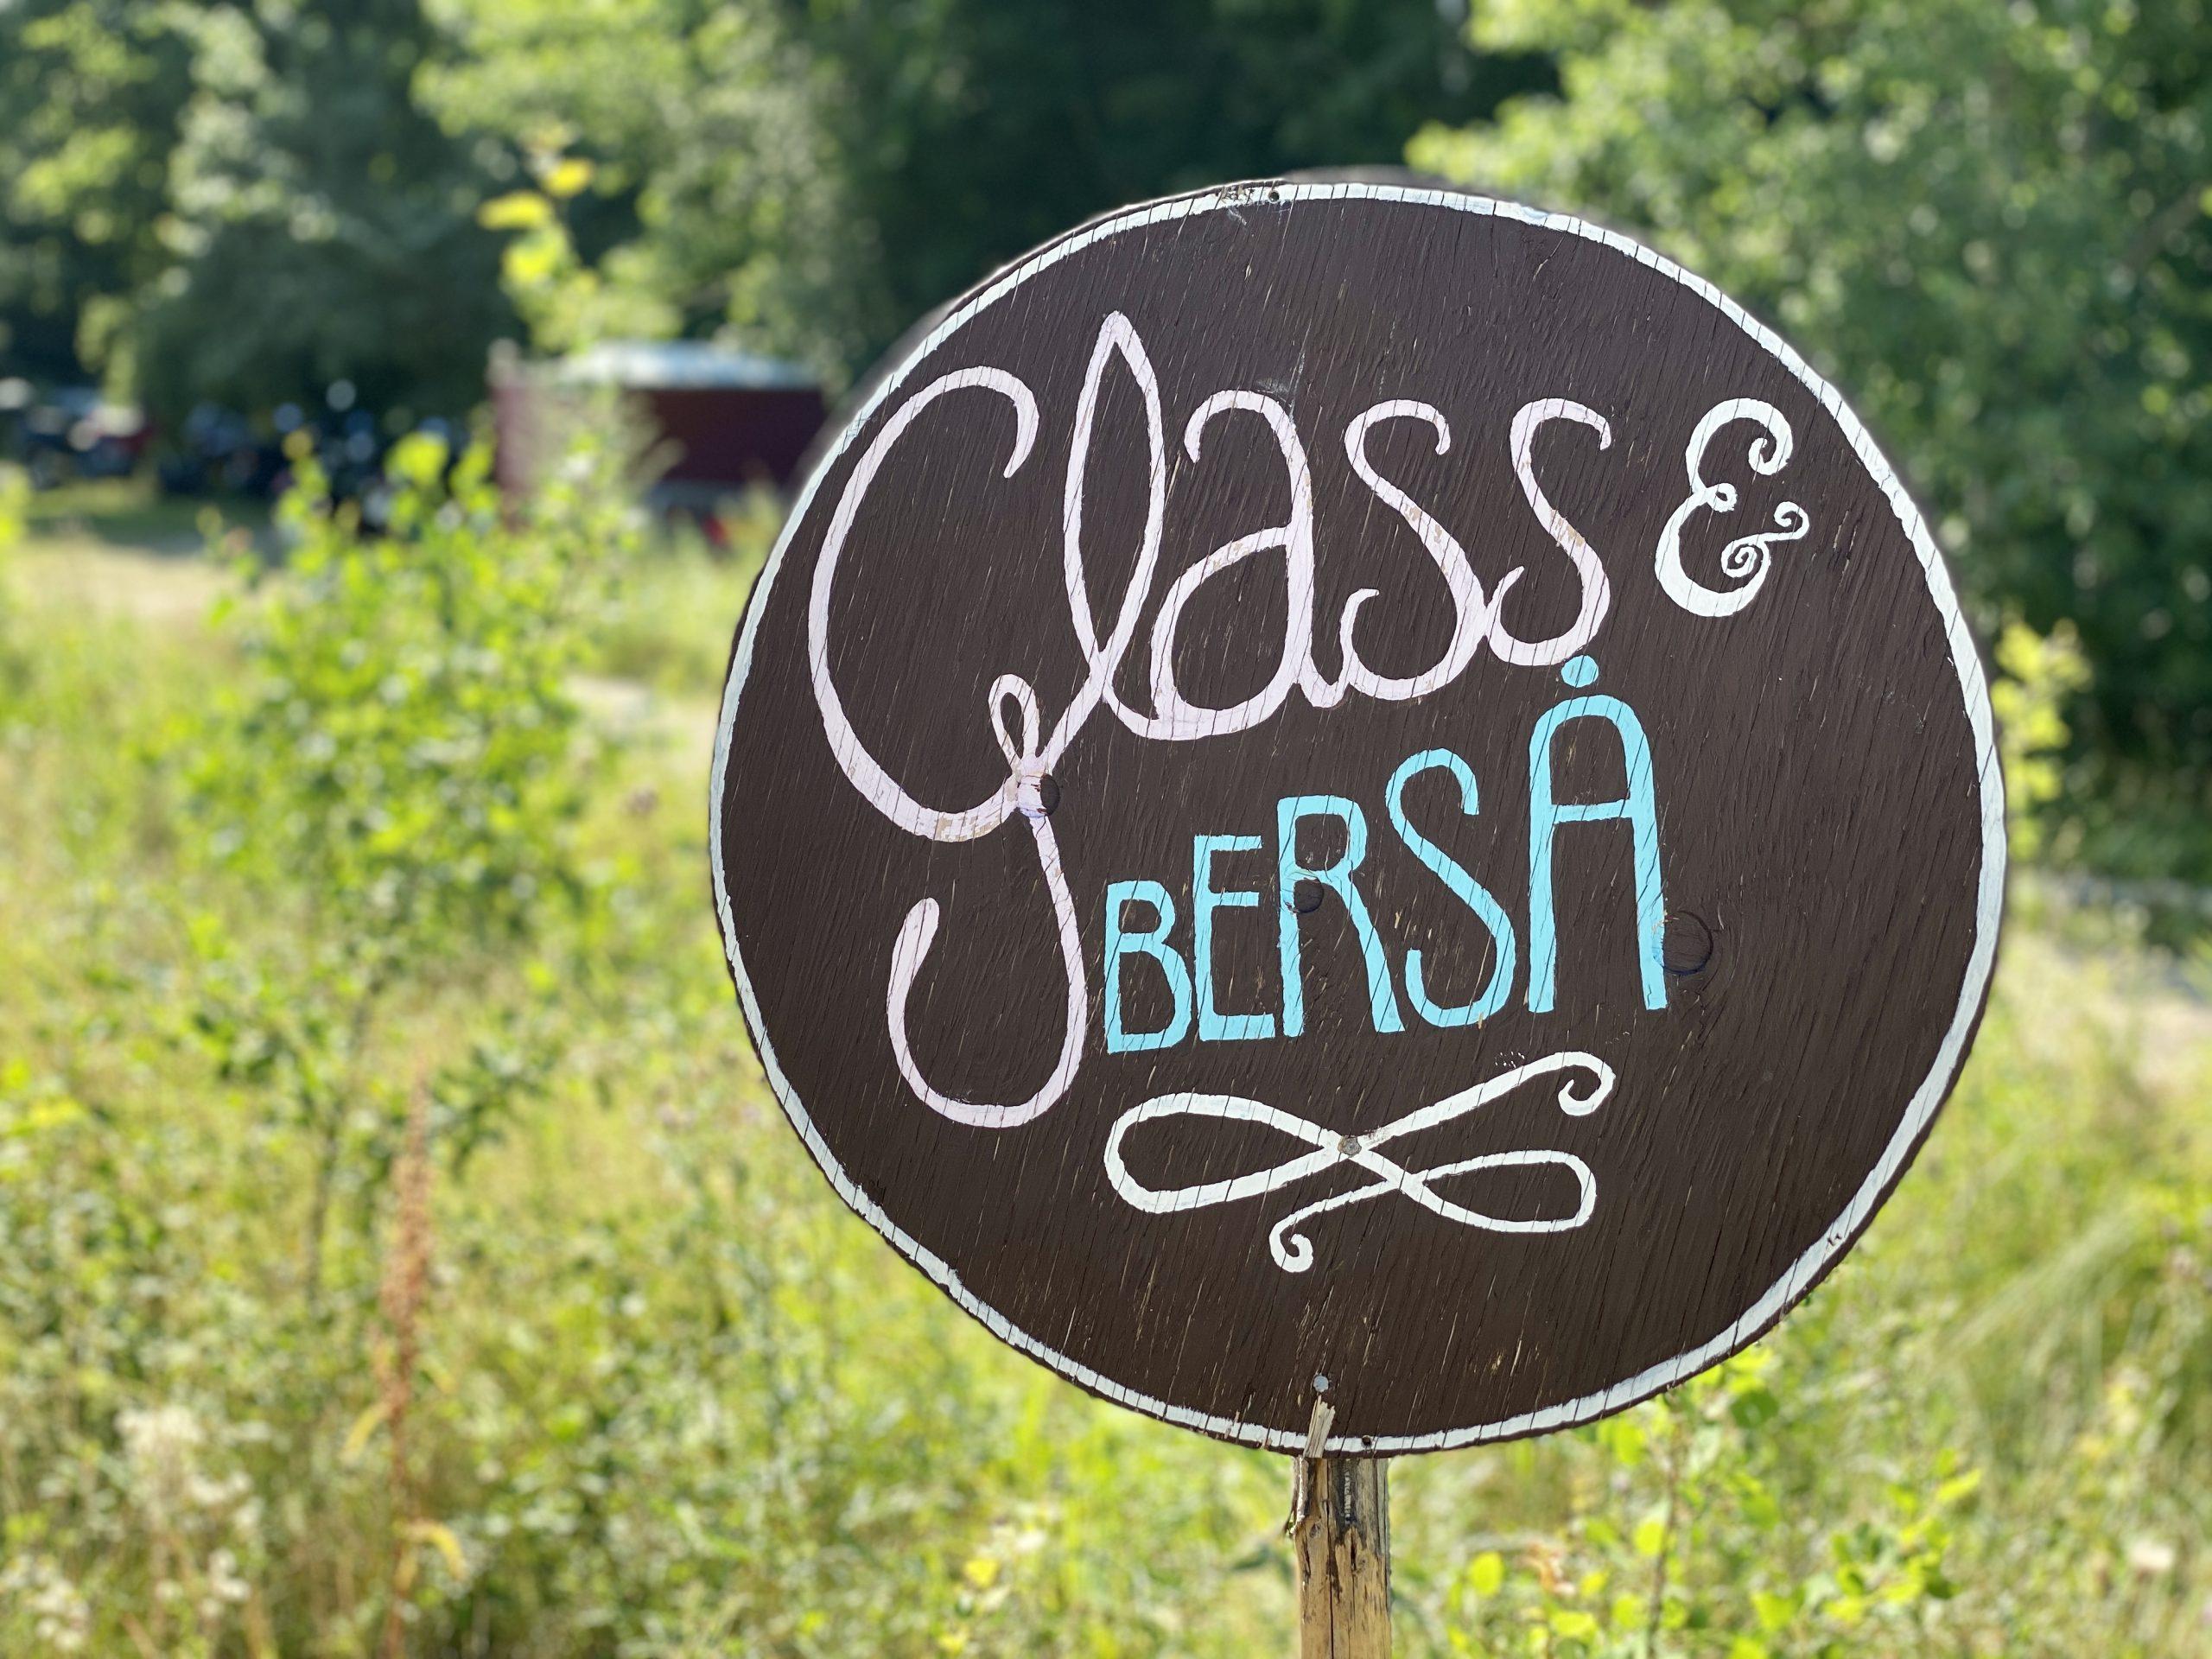 Glass & Berså